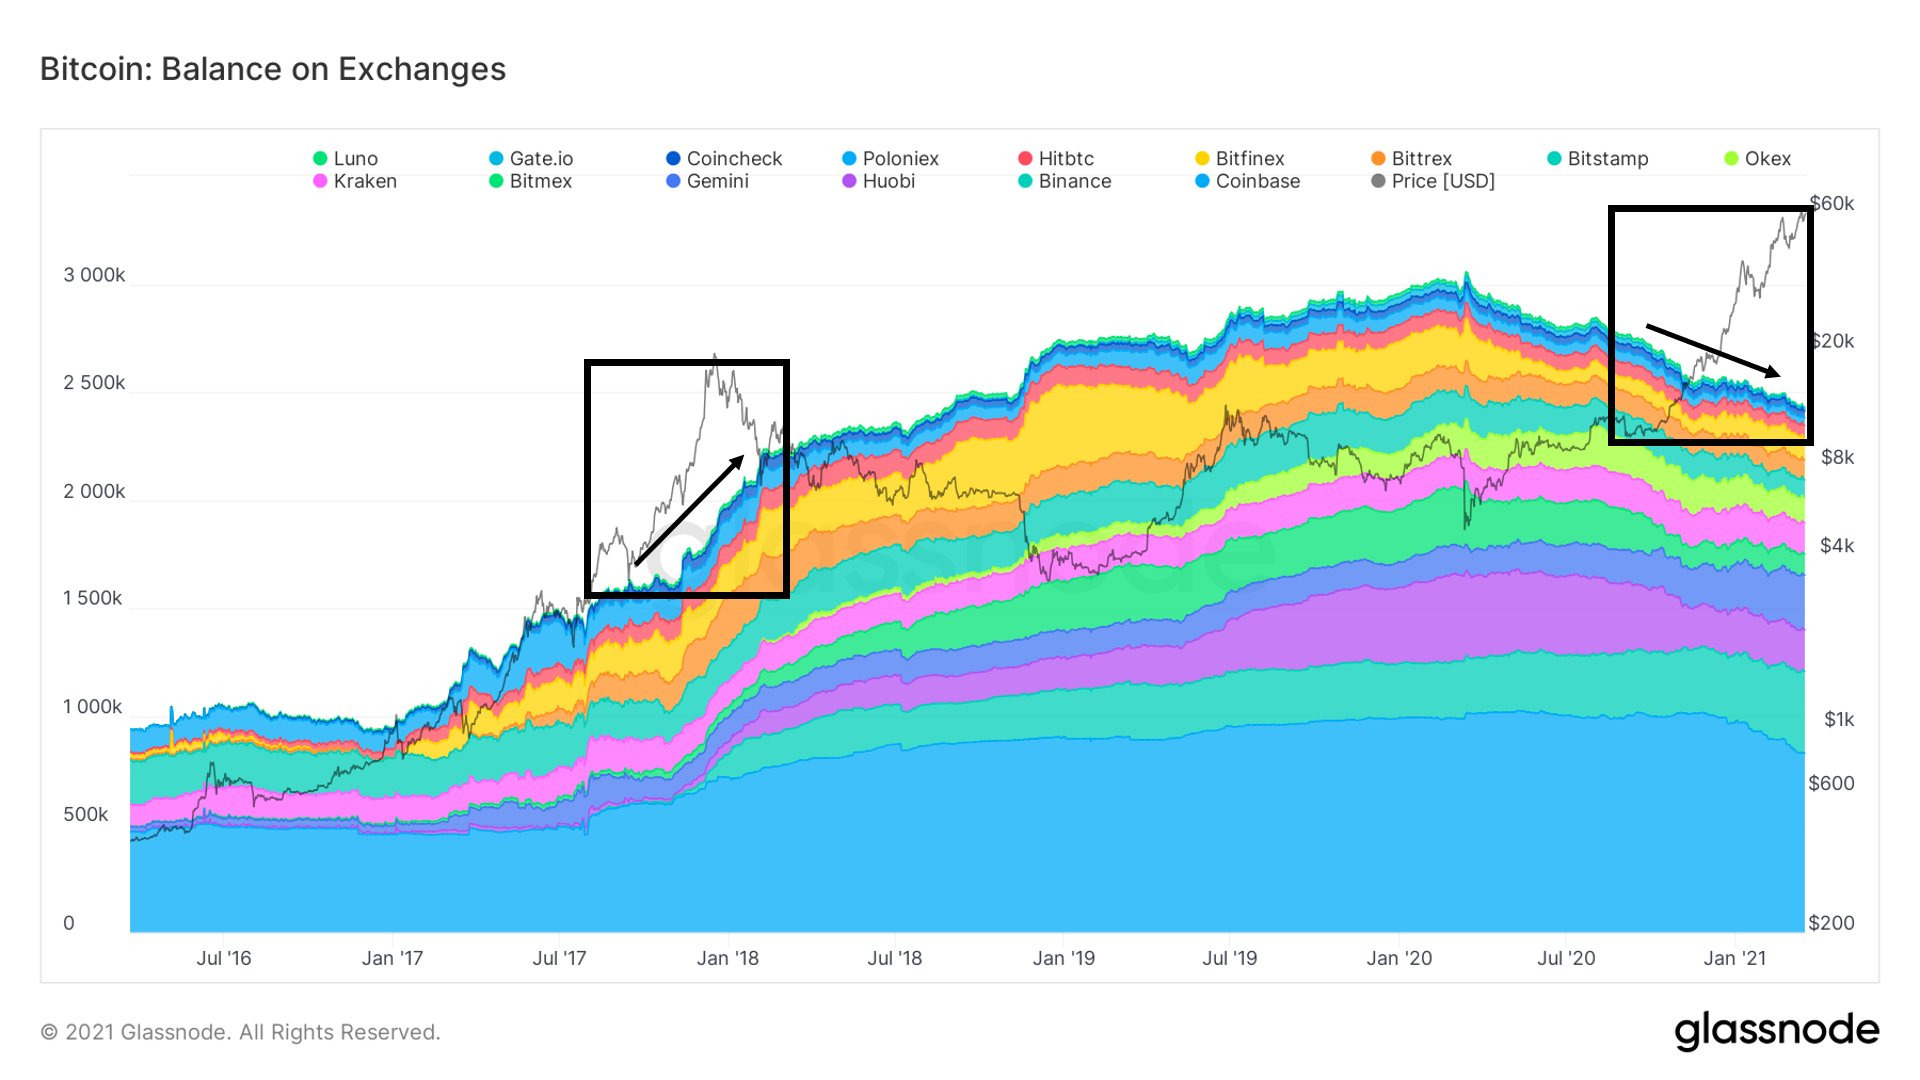 Glassnode: Bitcoin on Exchanges